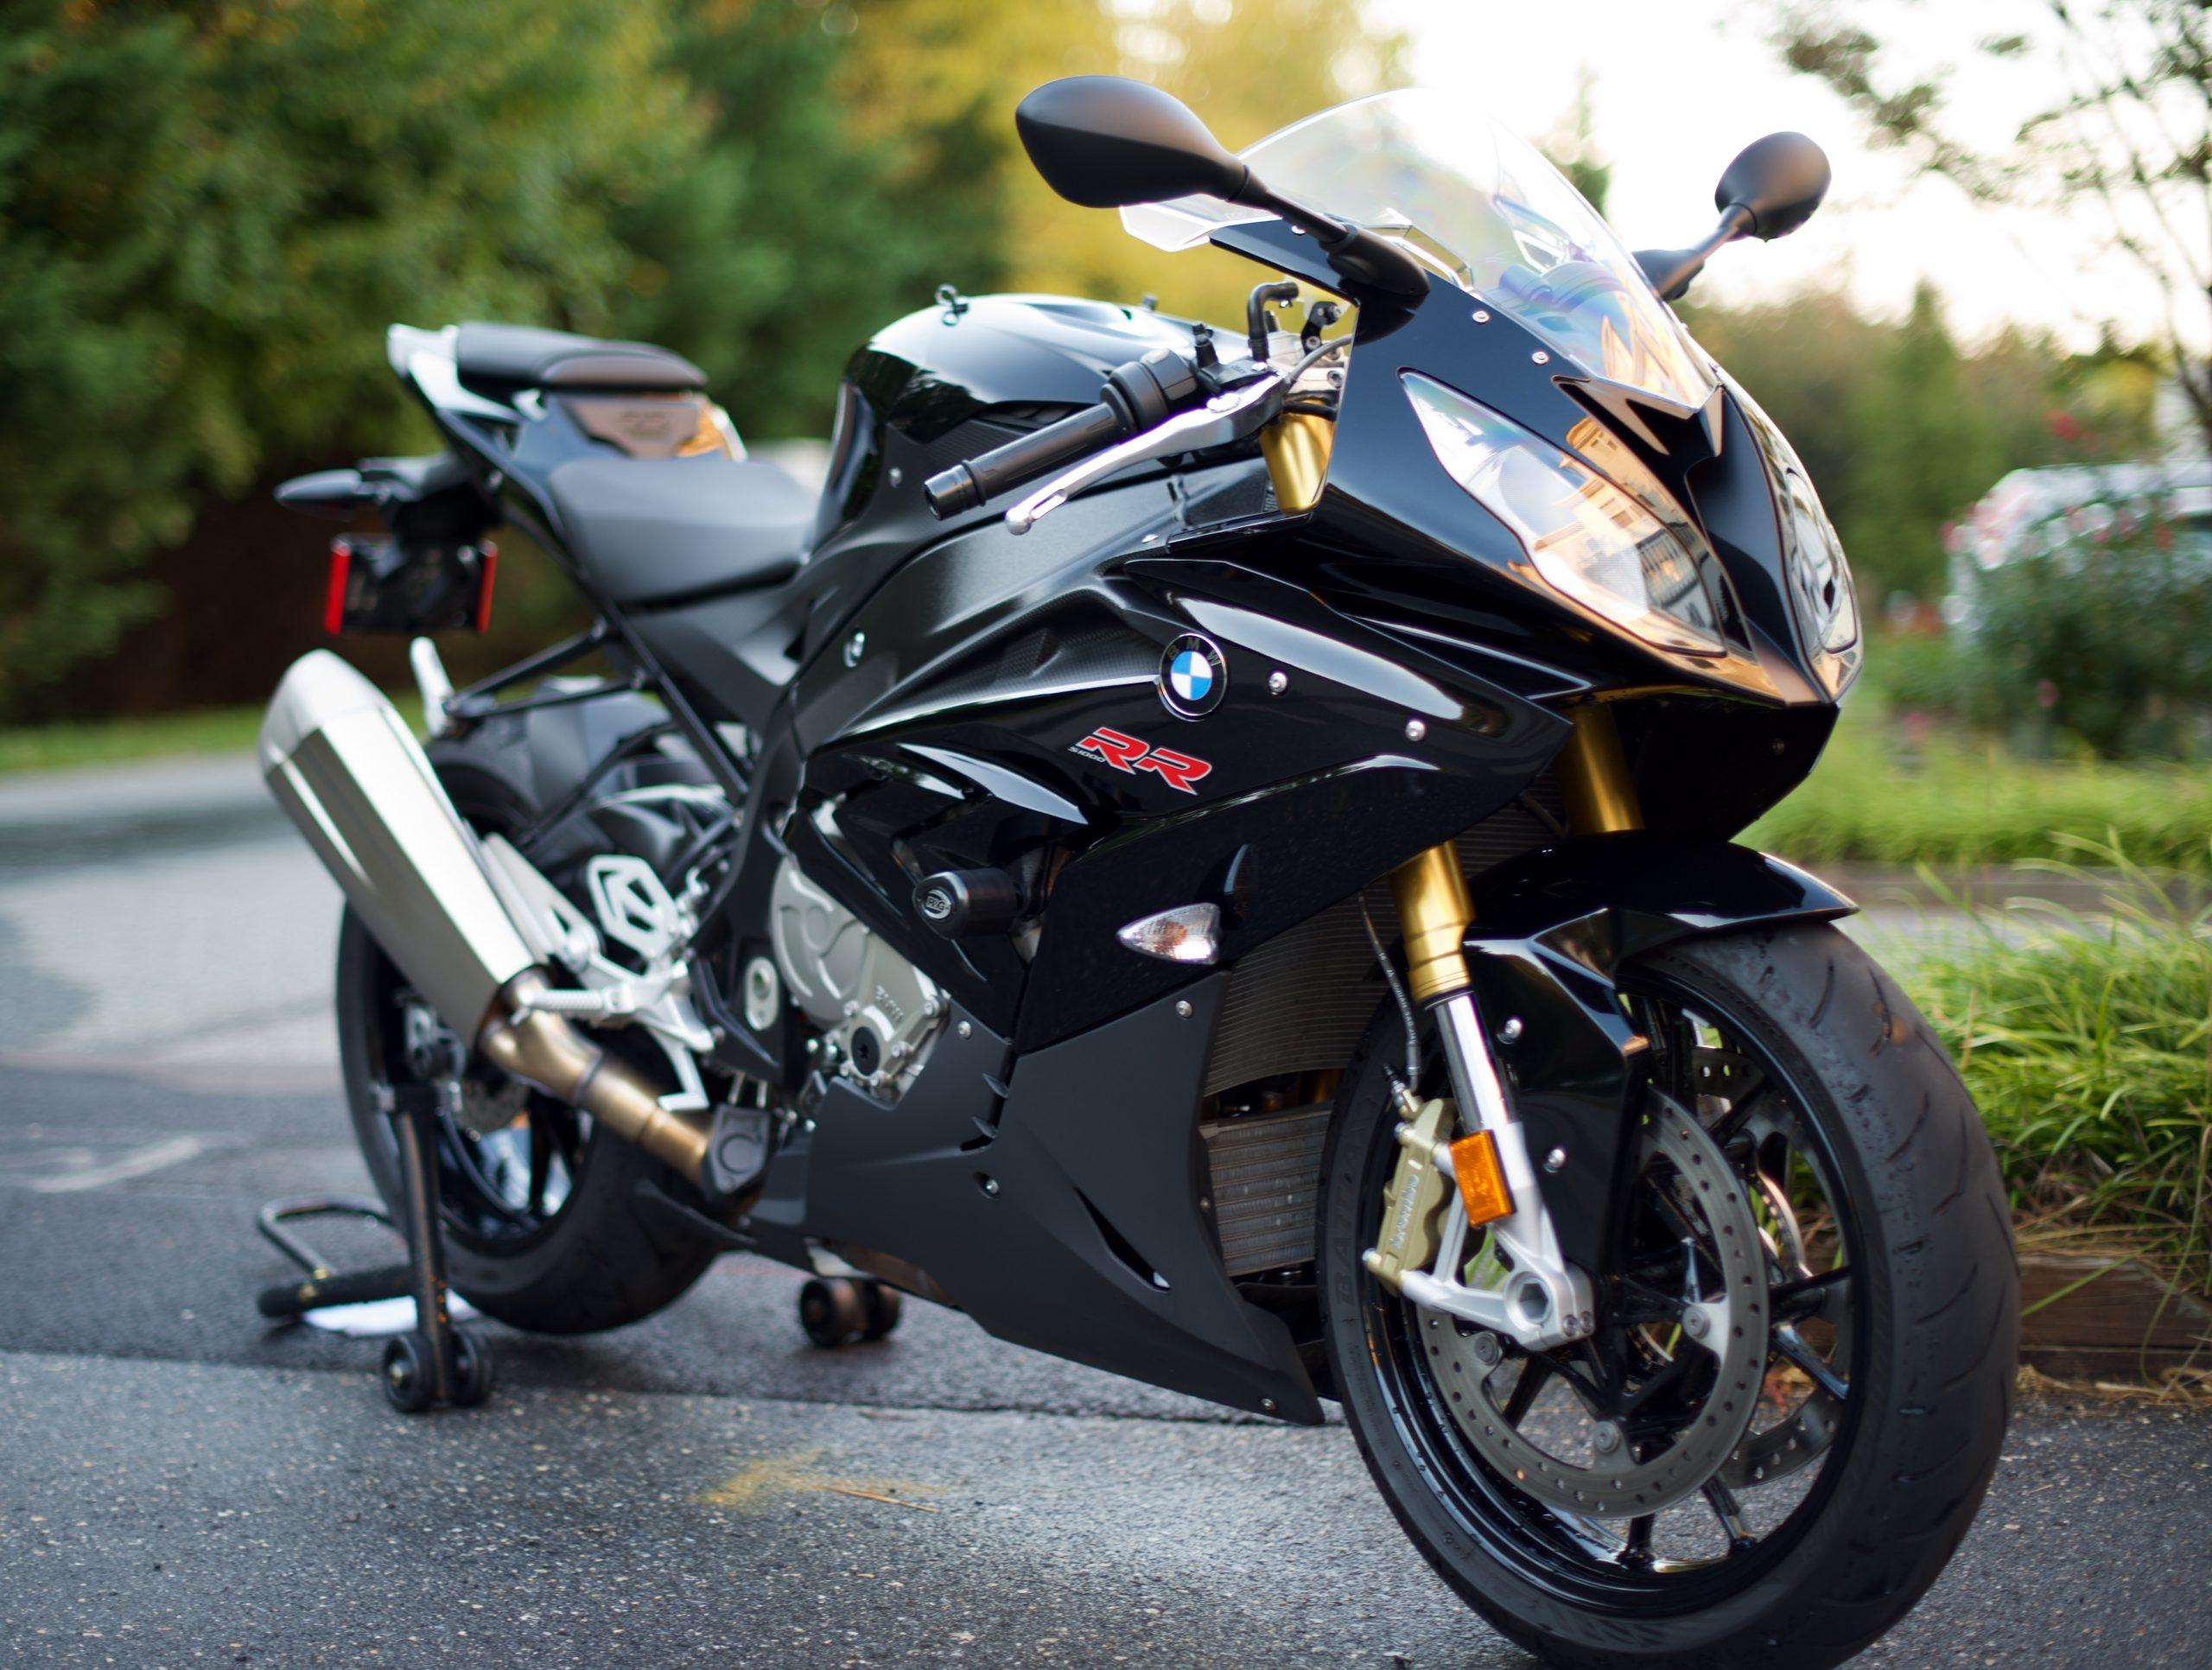 Мотоцикл S 1000 RR